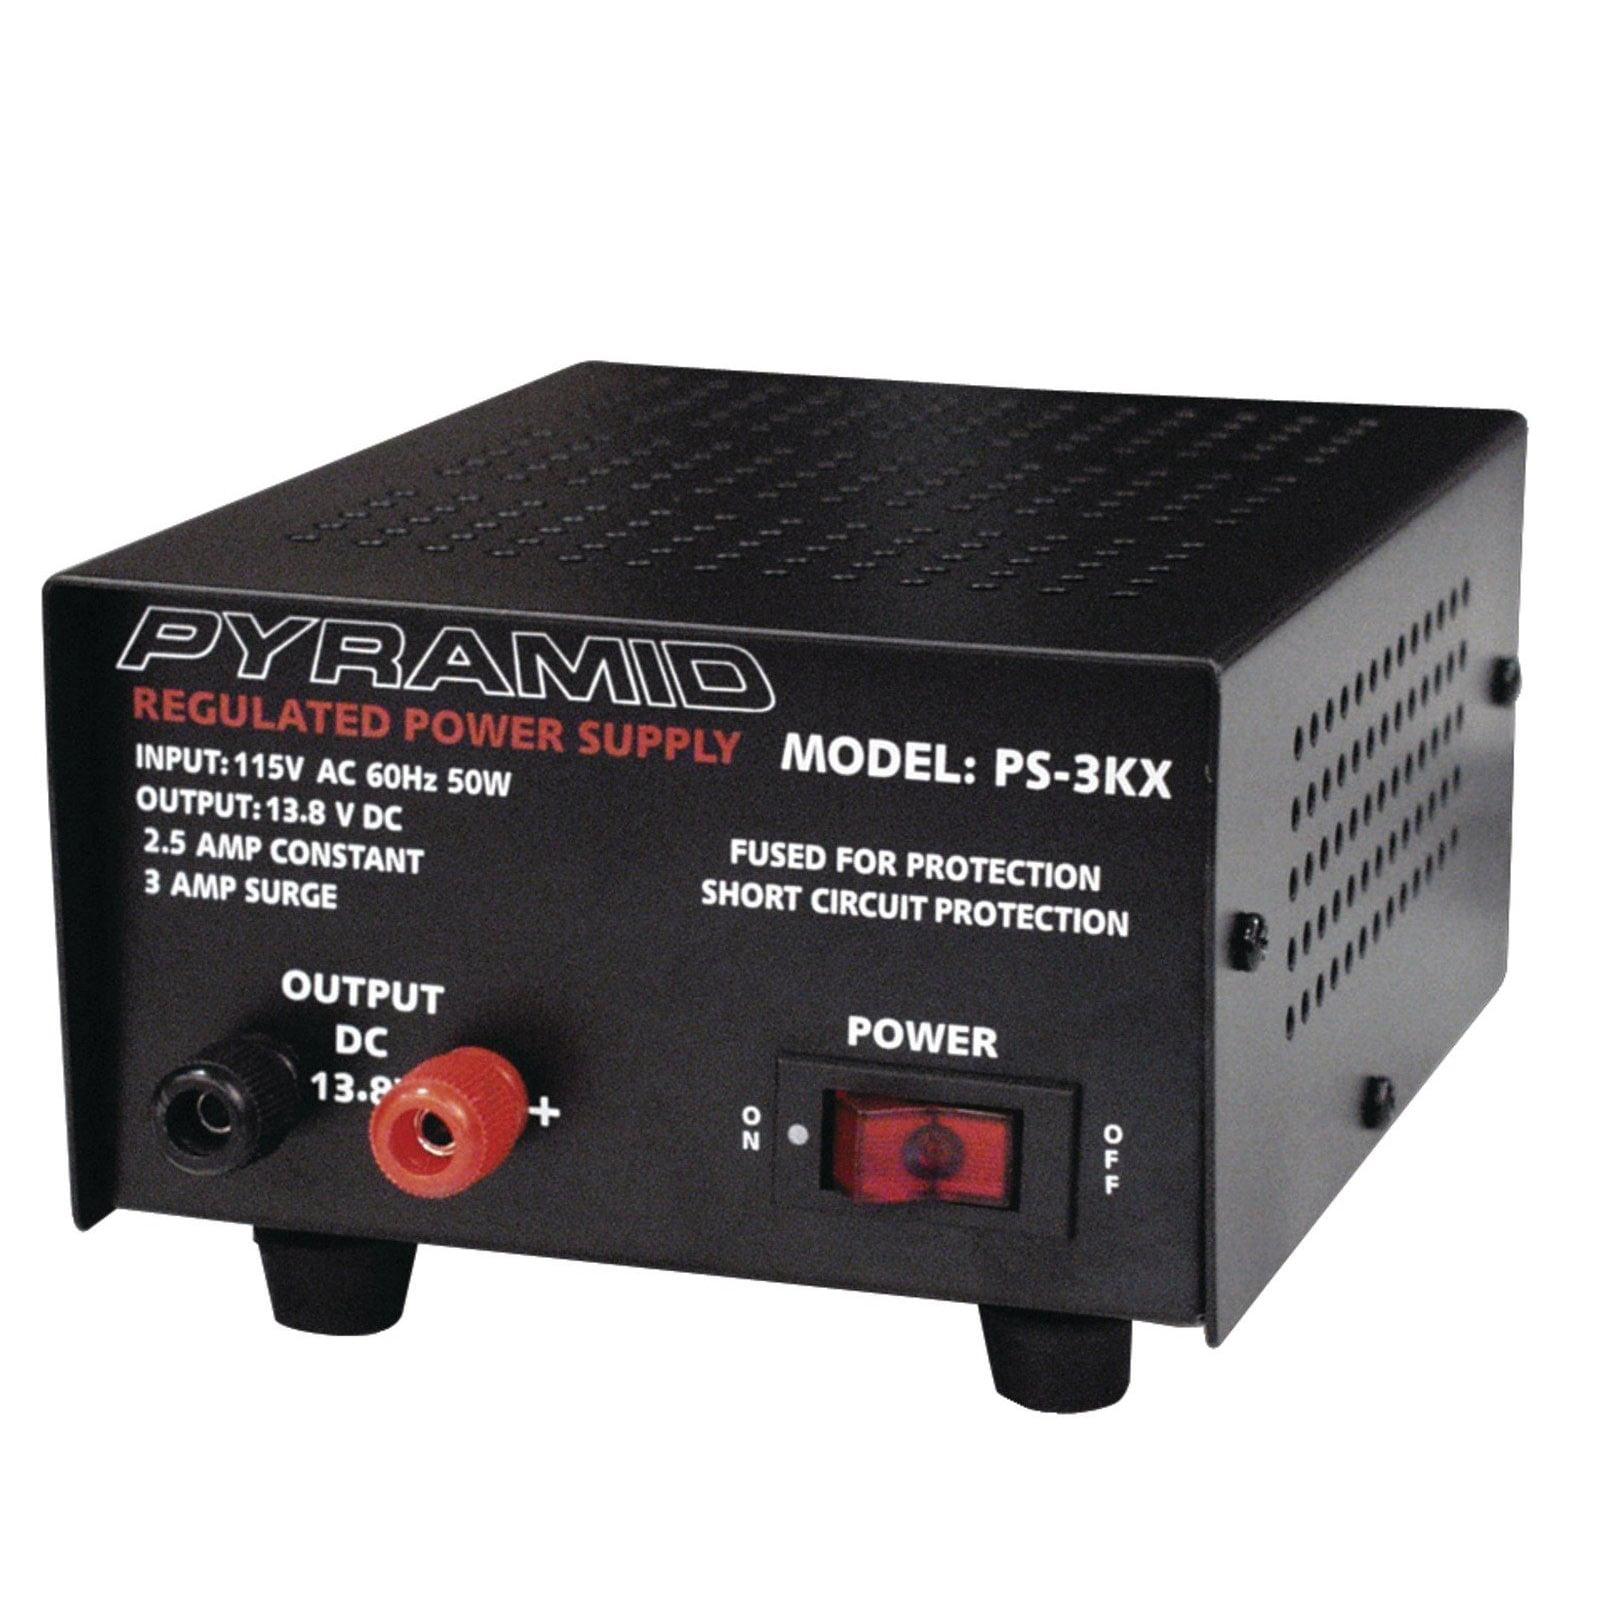 Pyramid 2.5 Amp Power Supply by Pyramid